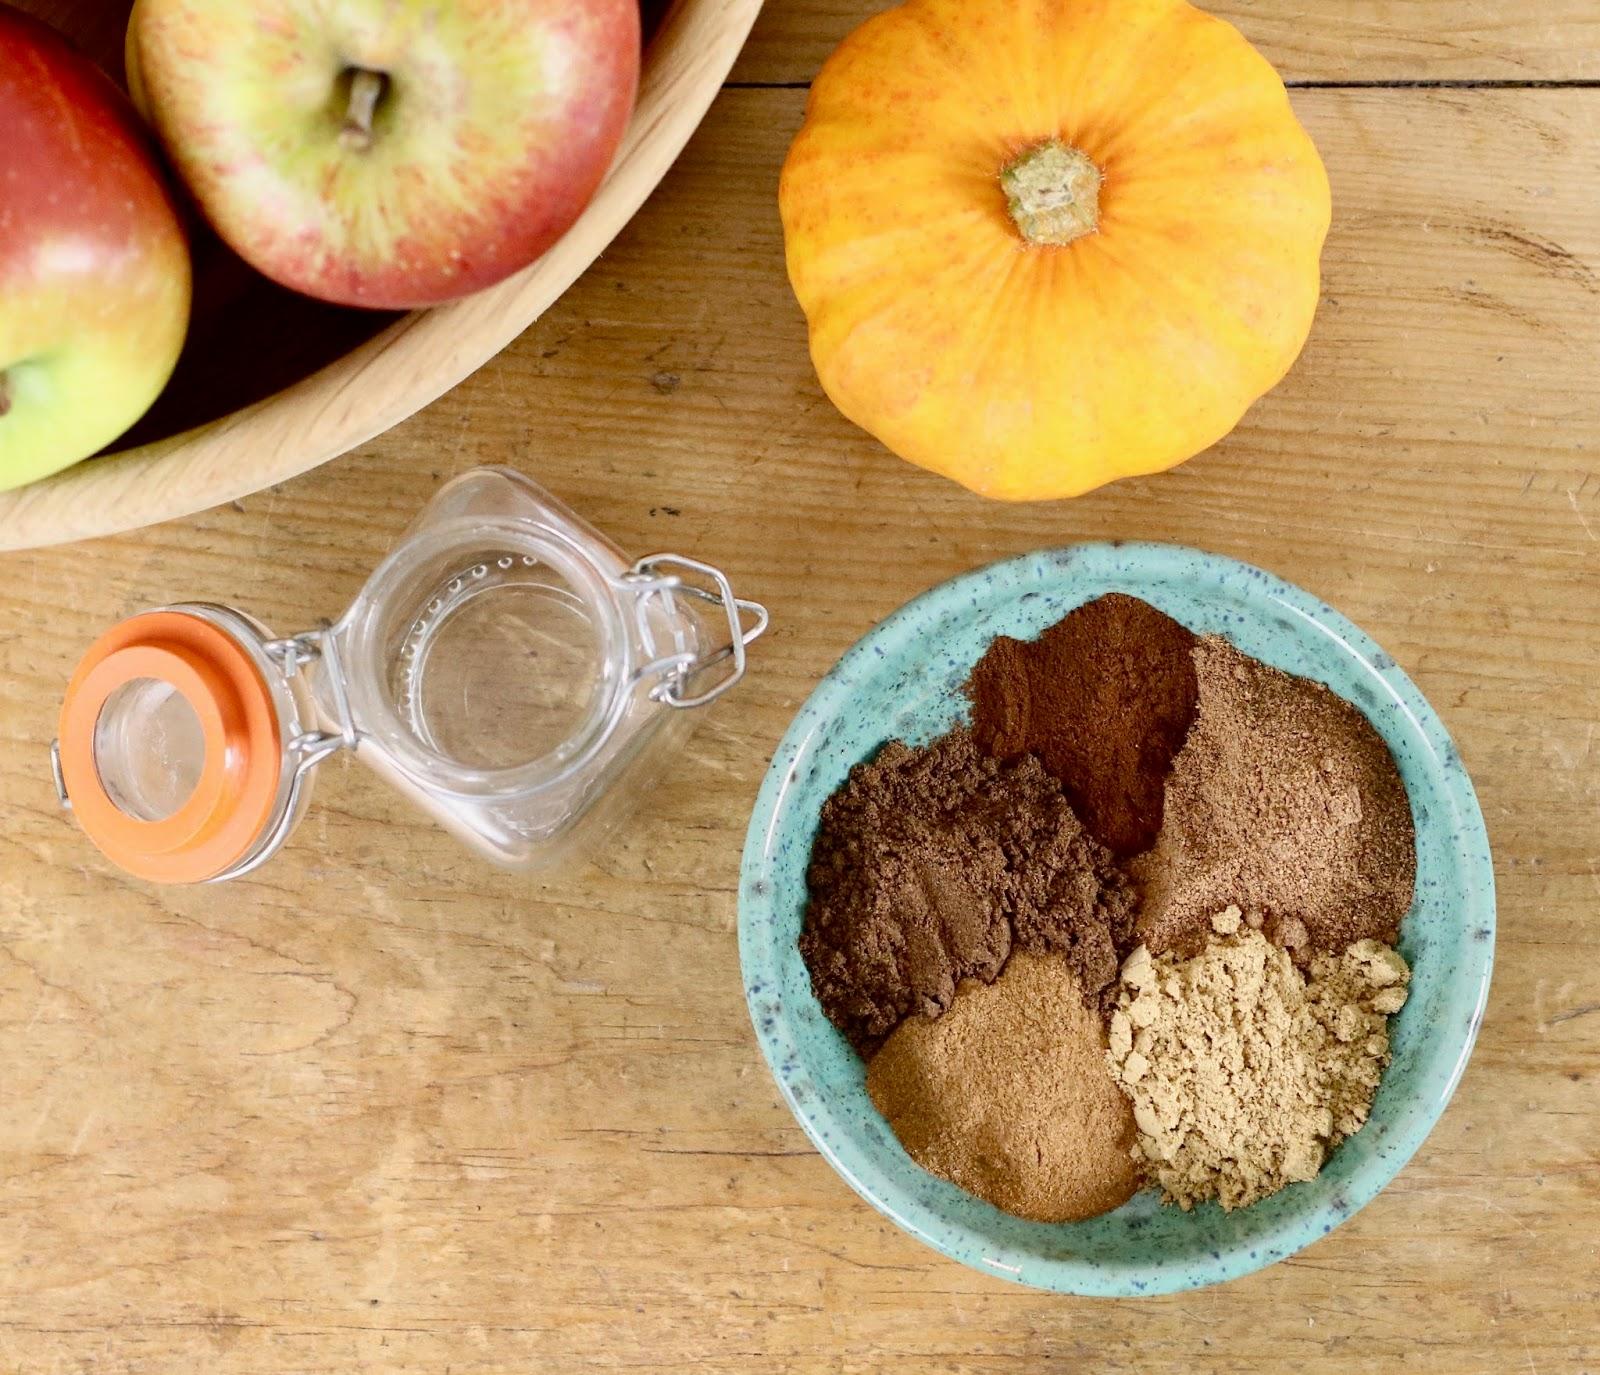 DIY-Pumpkin-spice-mix